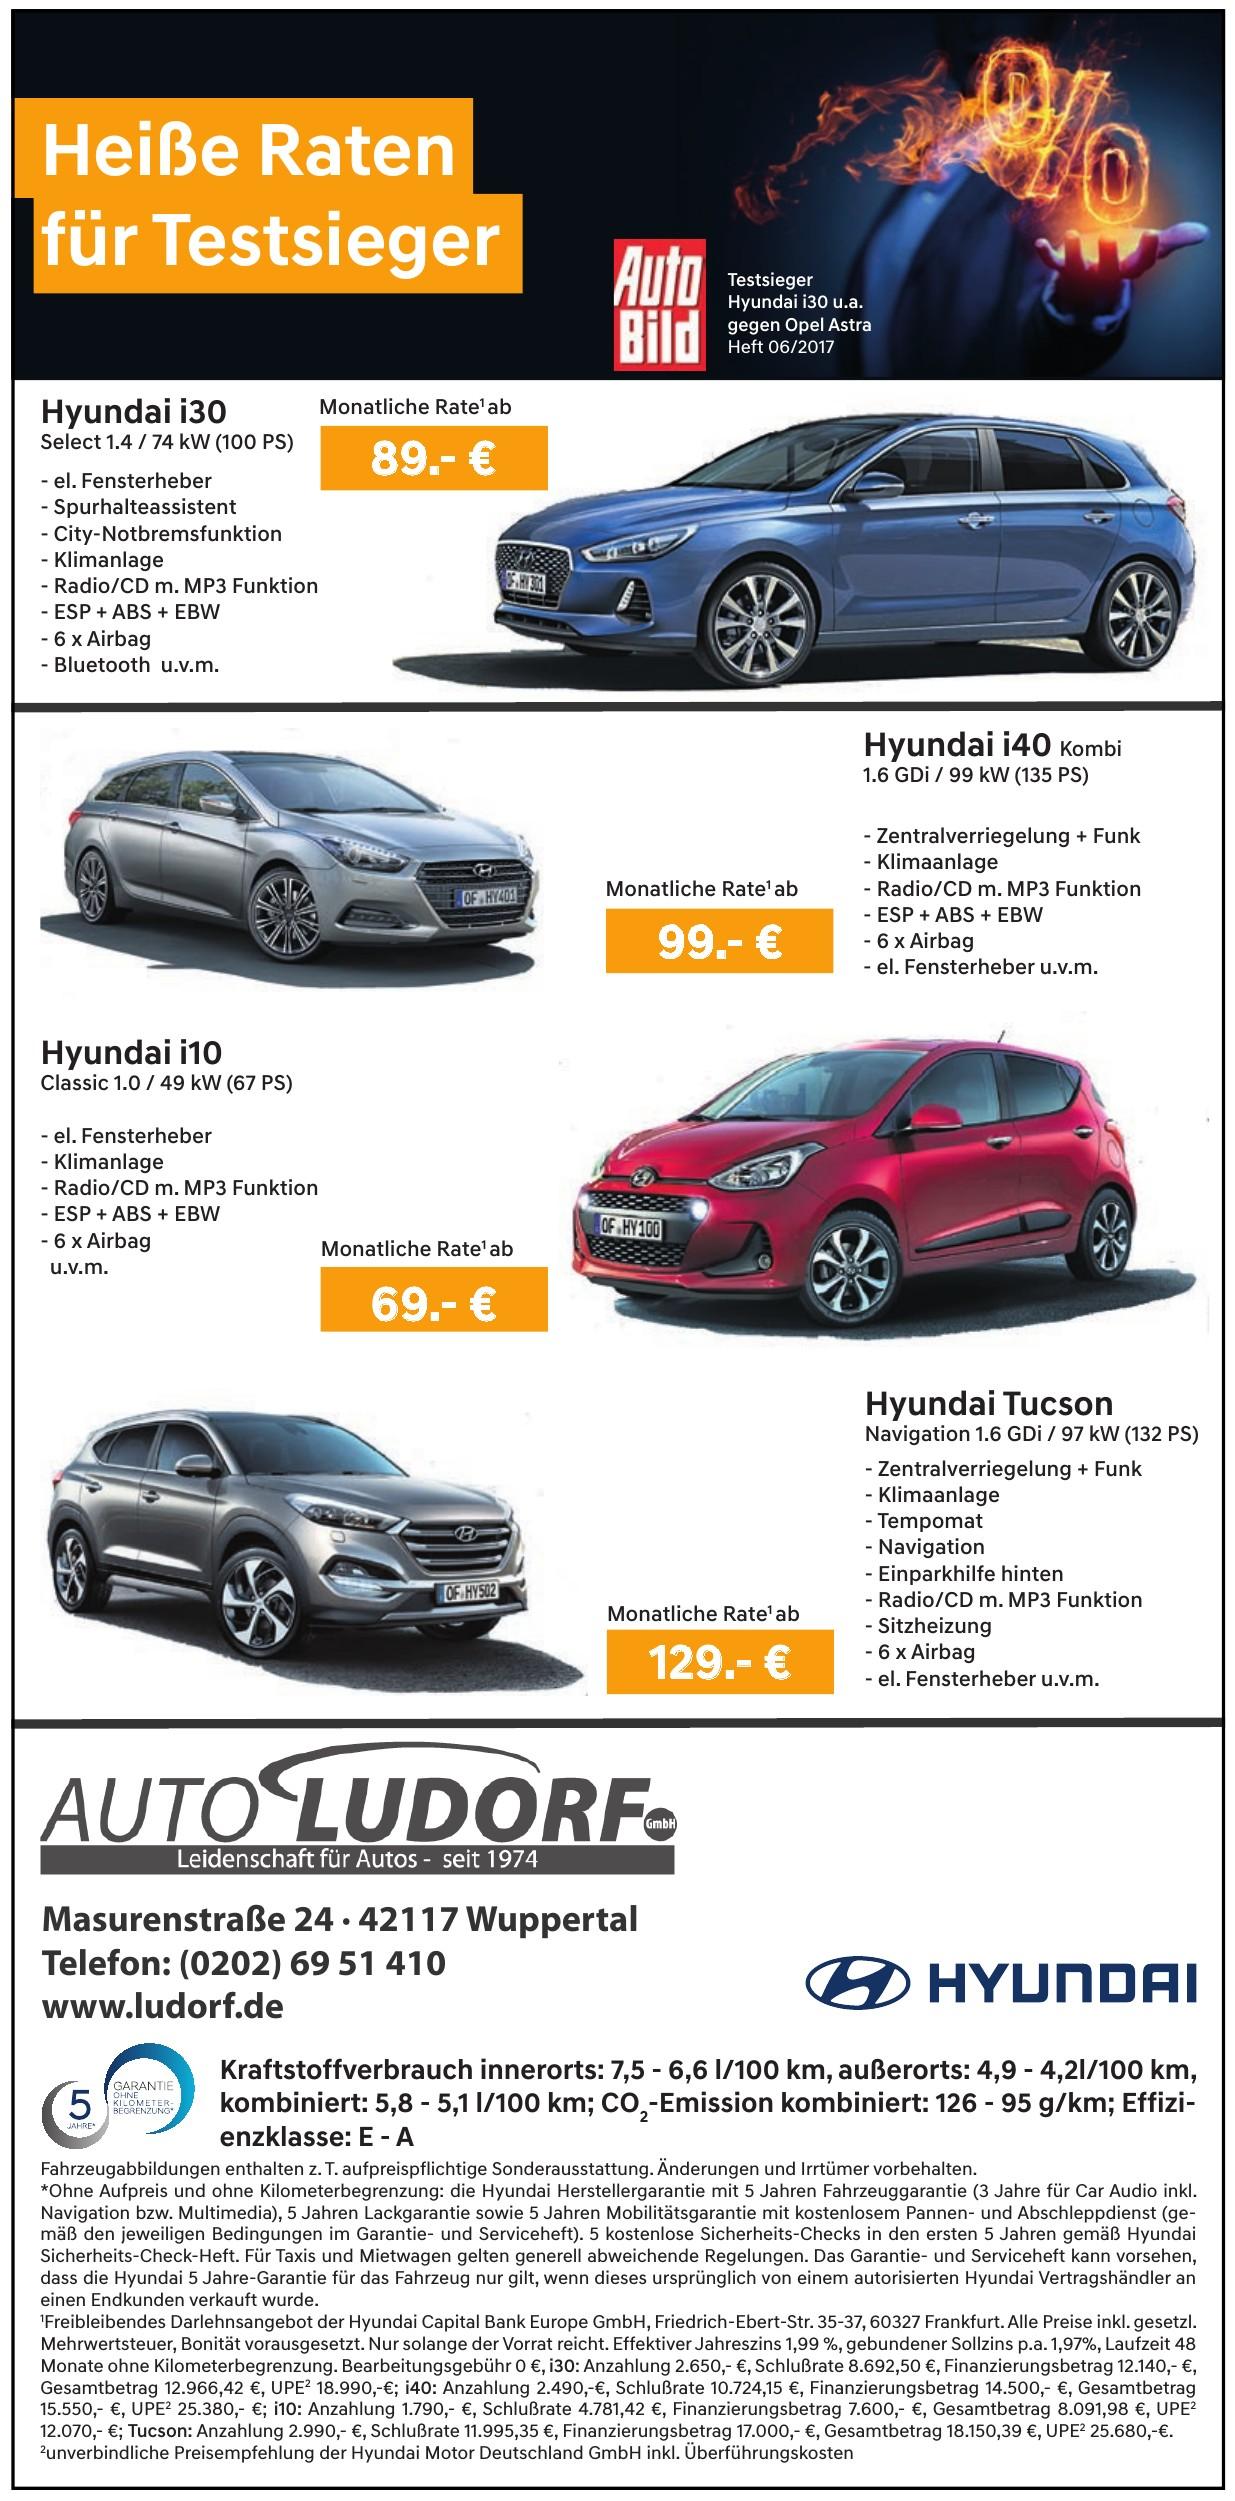 Auto Ludorf GmbH